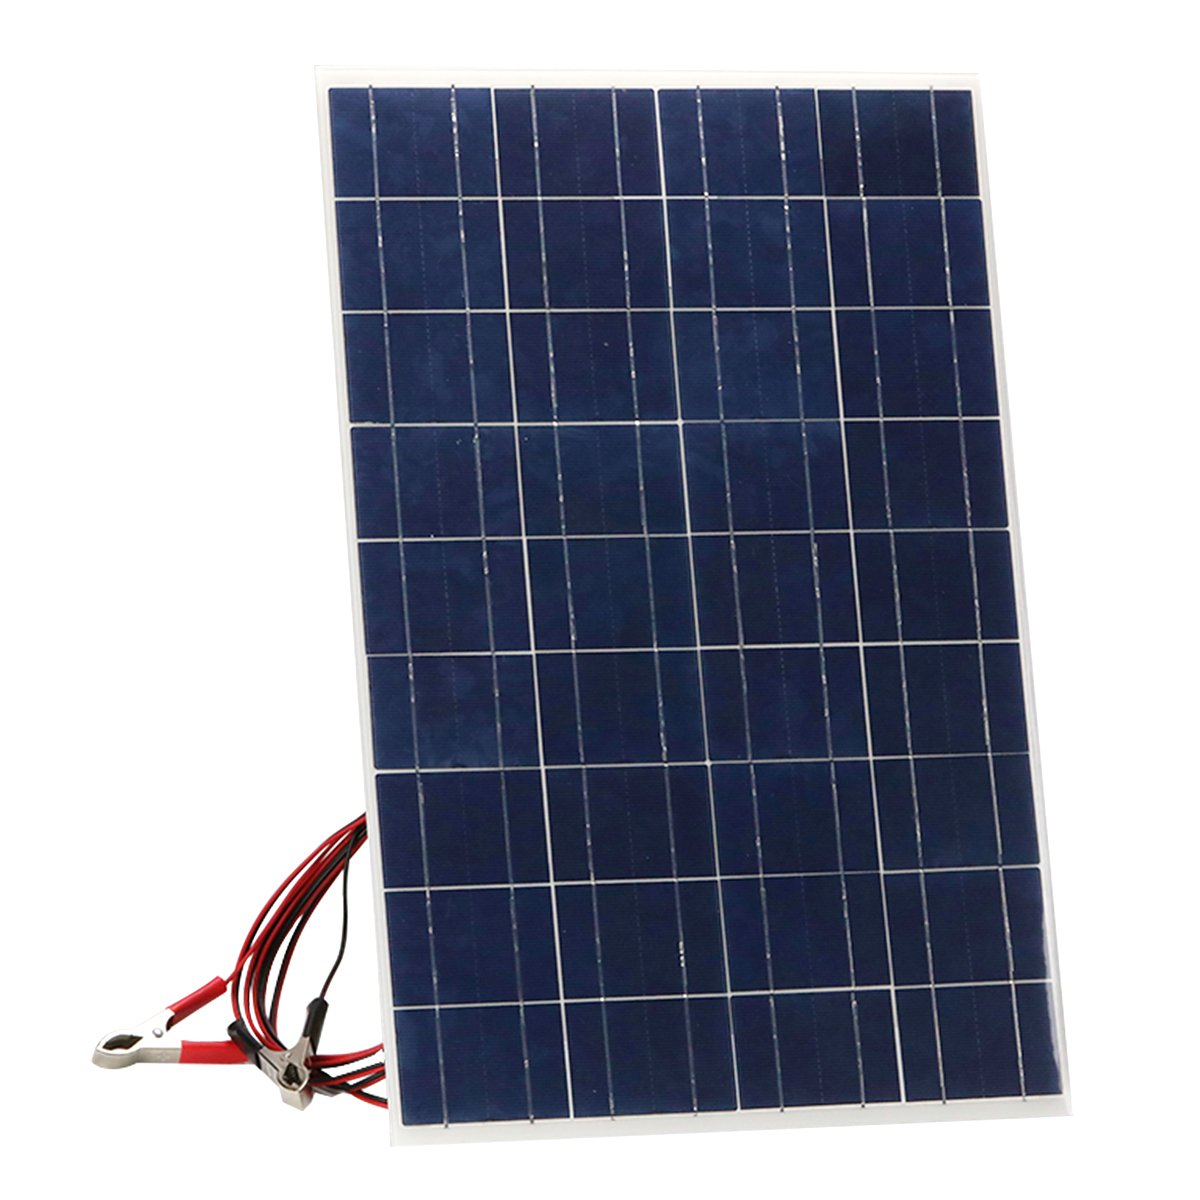 TISHI HERY 30W Solar Panel 18V 12V Semi Flexible Lightweight Thin Solar Panel Charger for RV, Car, Motorcycle, Boat